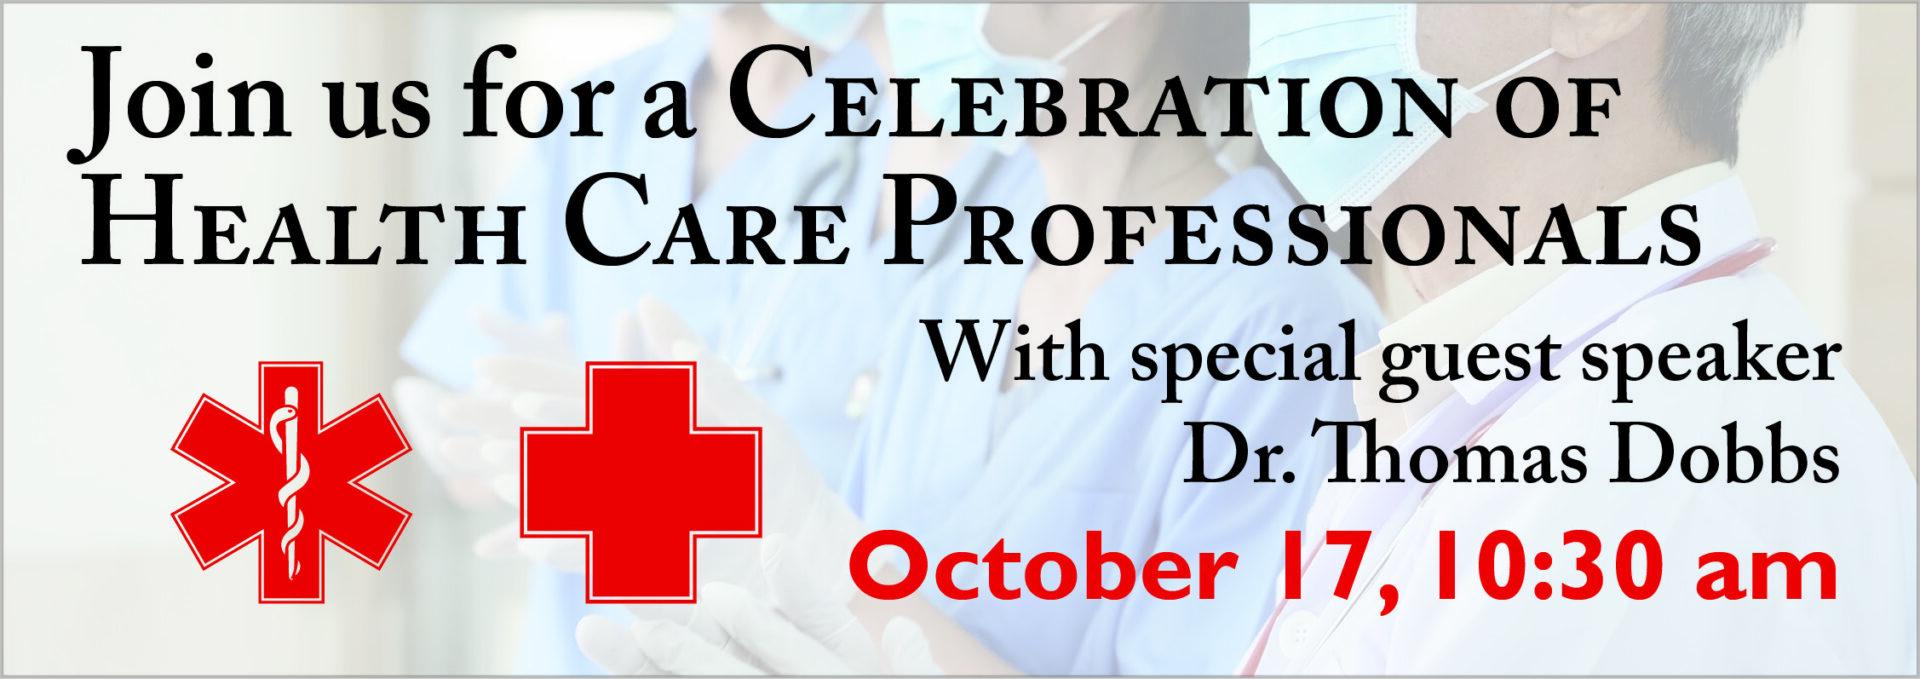 Celebration of Health Care Professionals